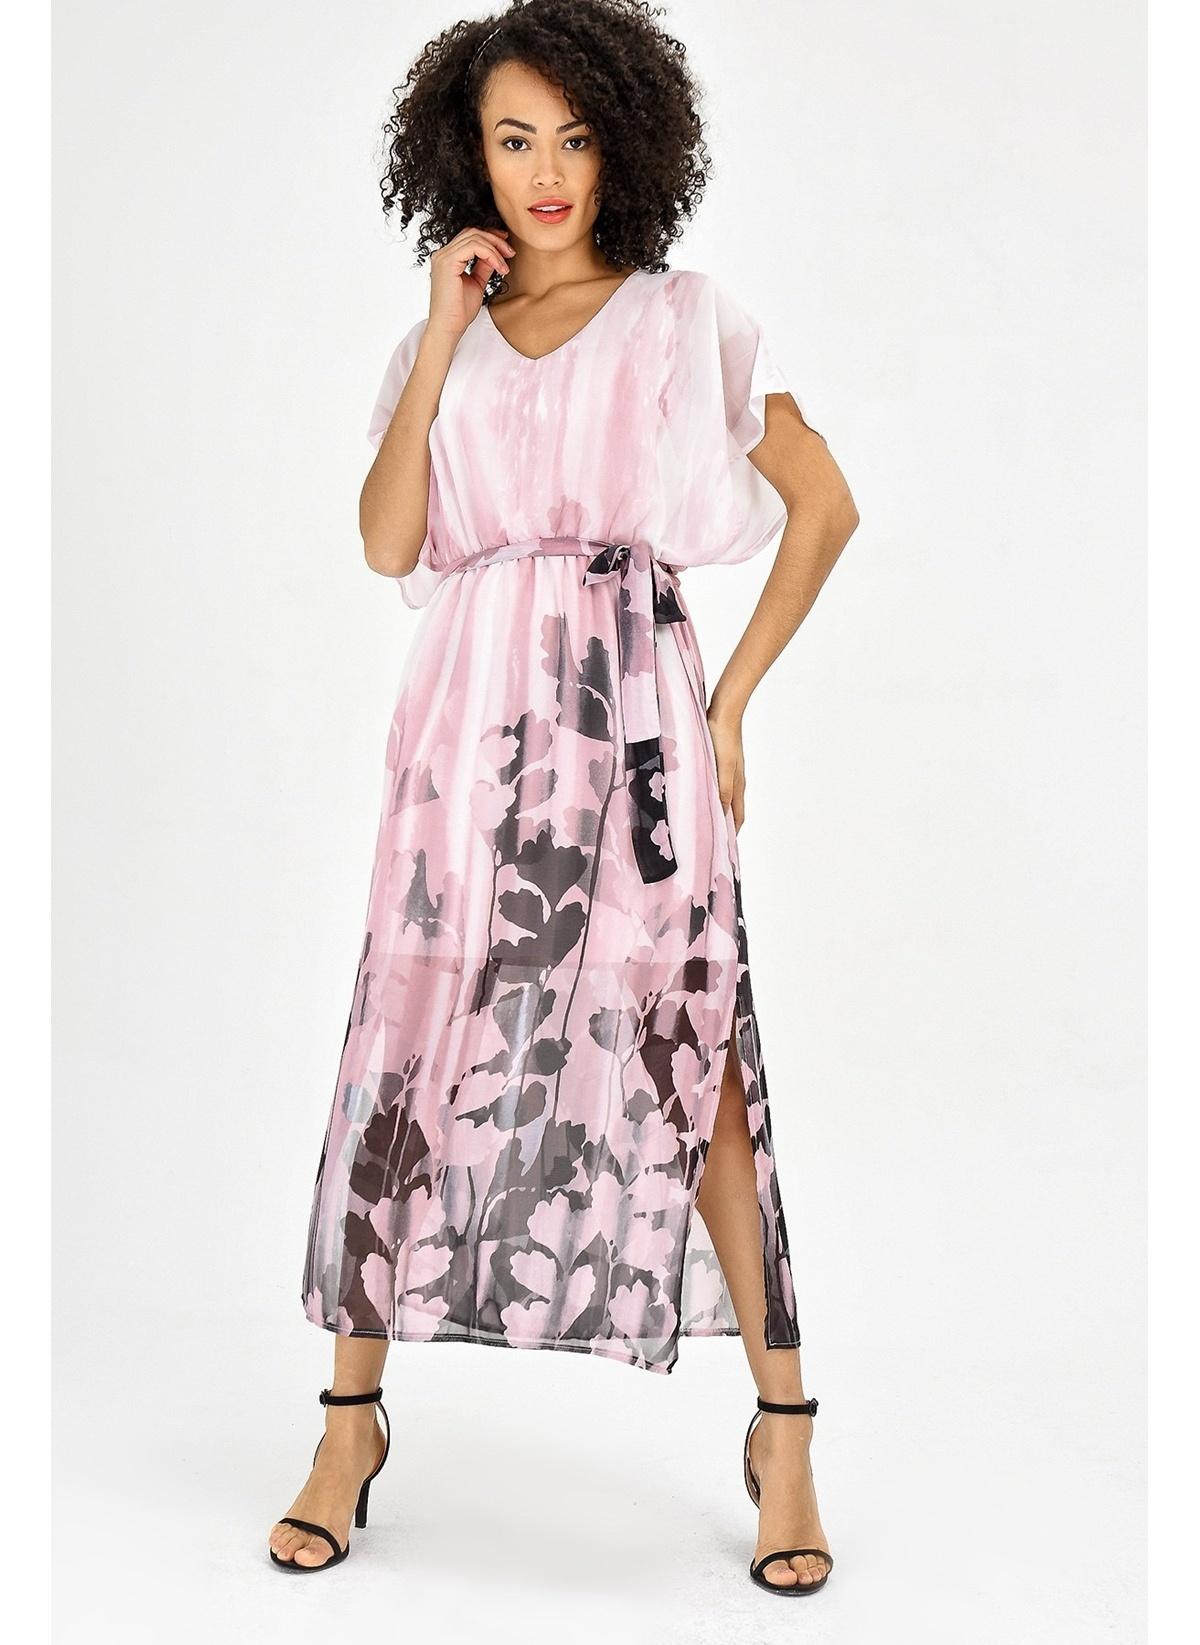 c7018c9f0c410 Jument Kadın Şifon V Yaka Yarasa Salaş Beli Lastikli Elbise Pembe Ç ...